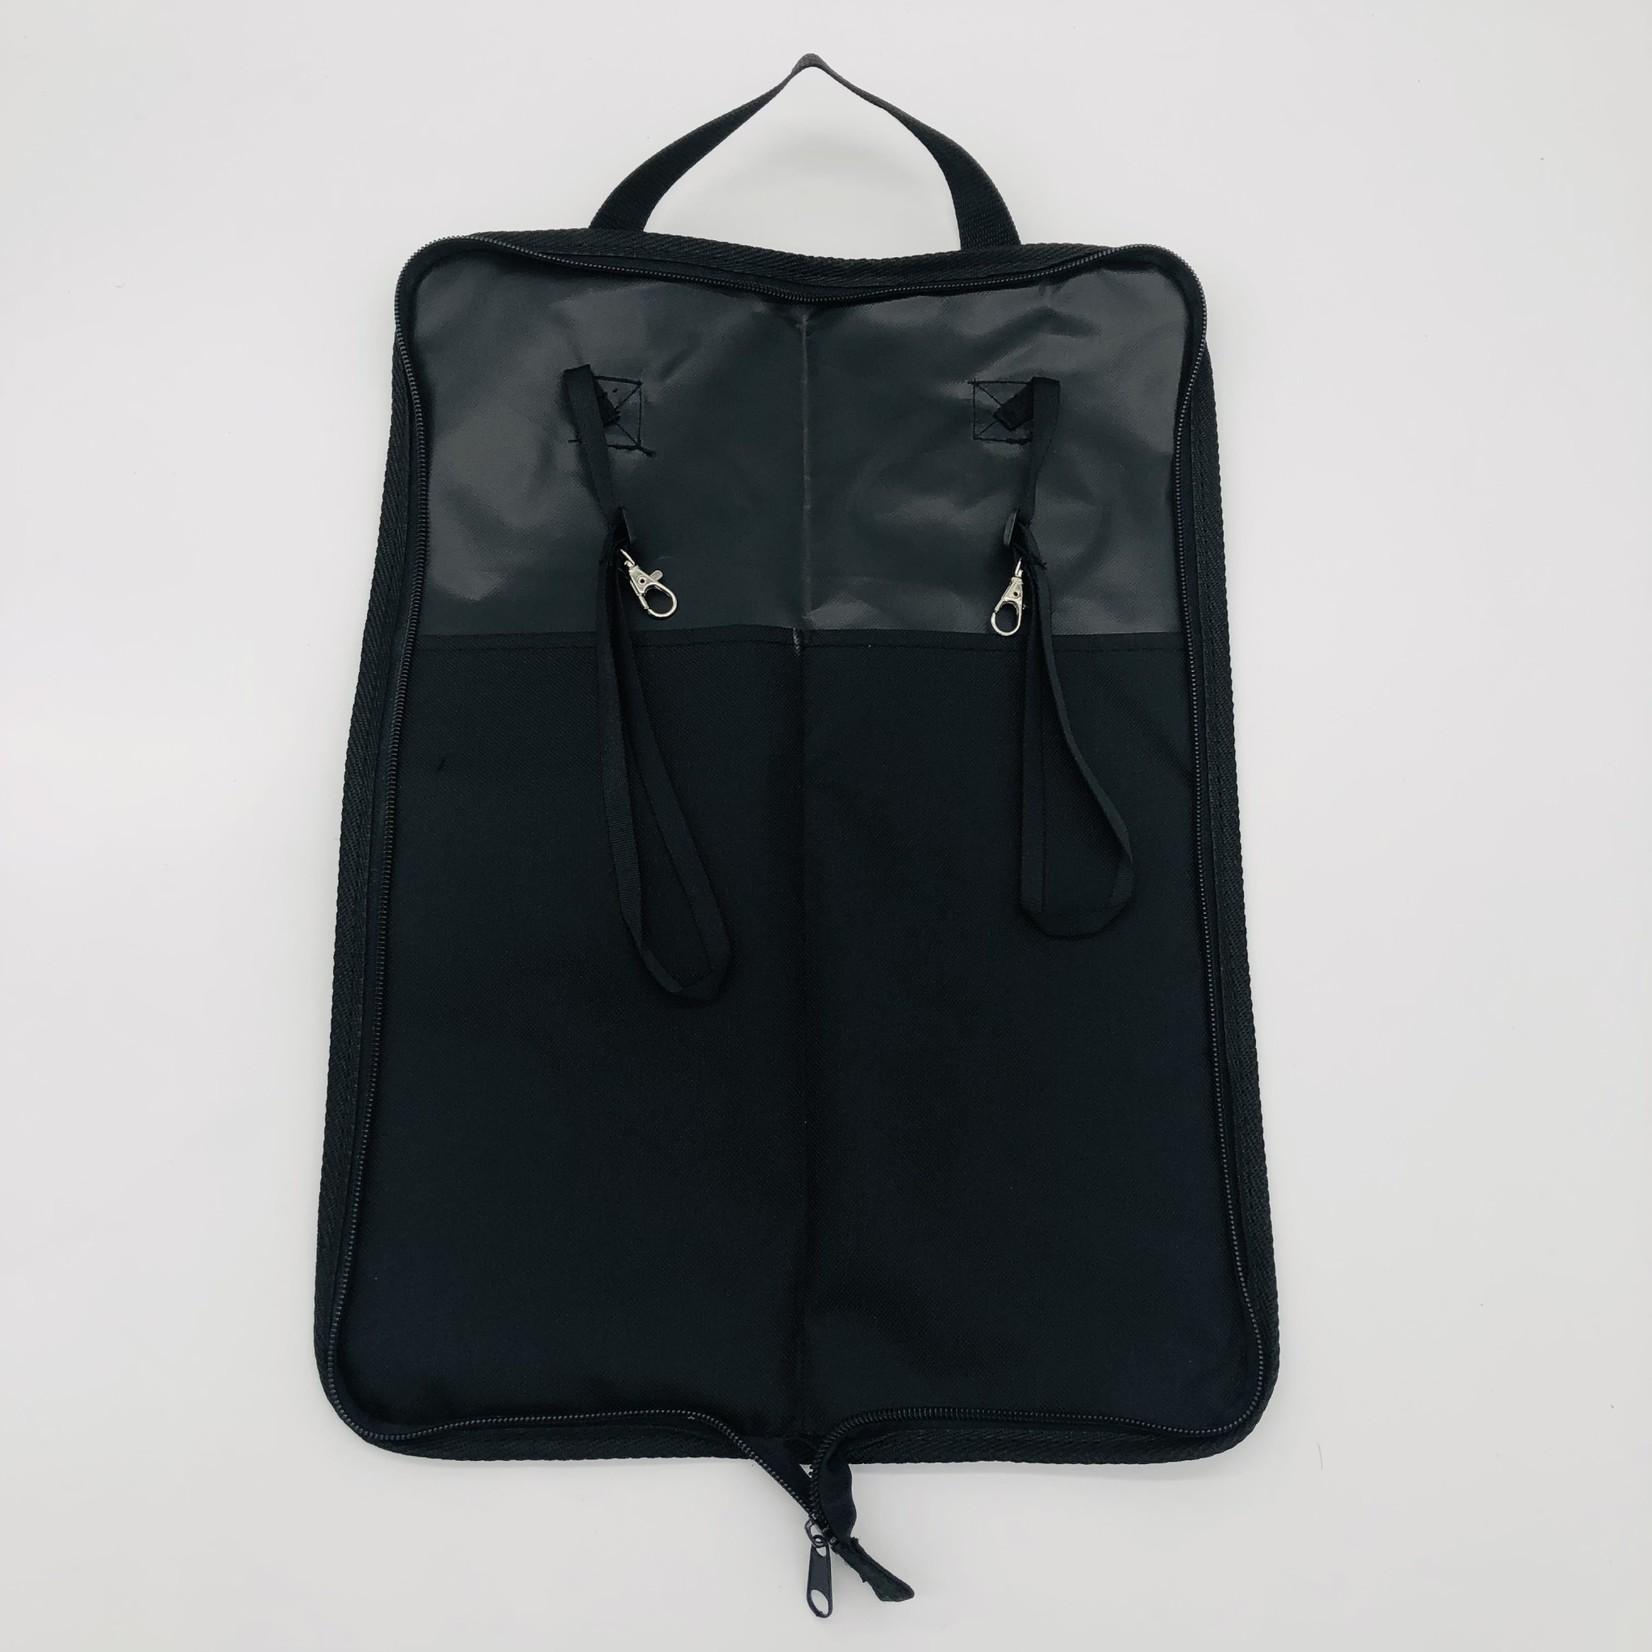 Beato BEATO PRO 3 STICK BAG UPNSB3